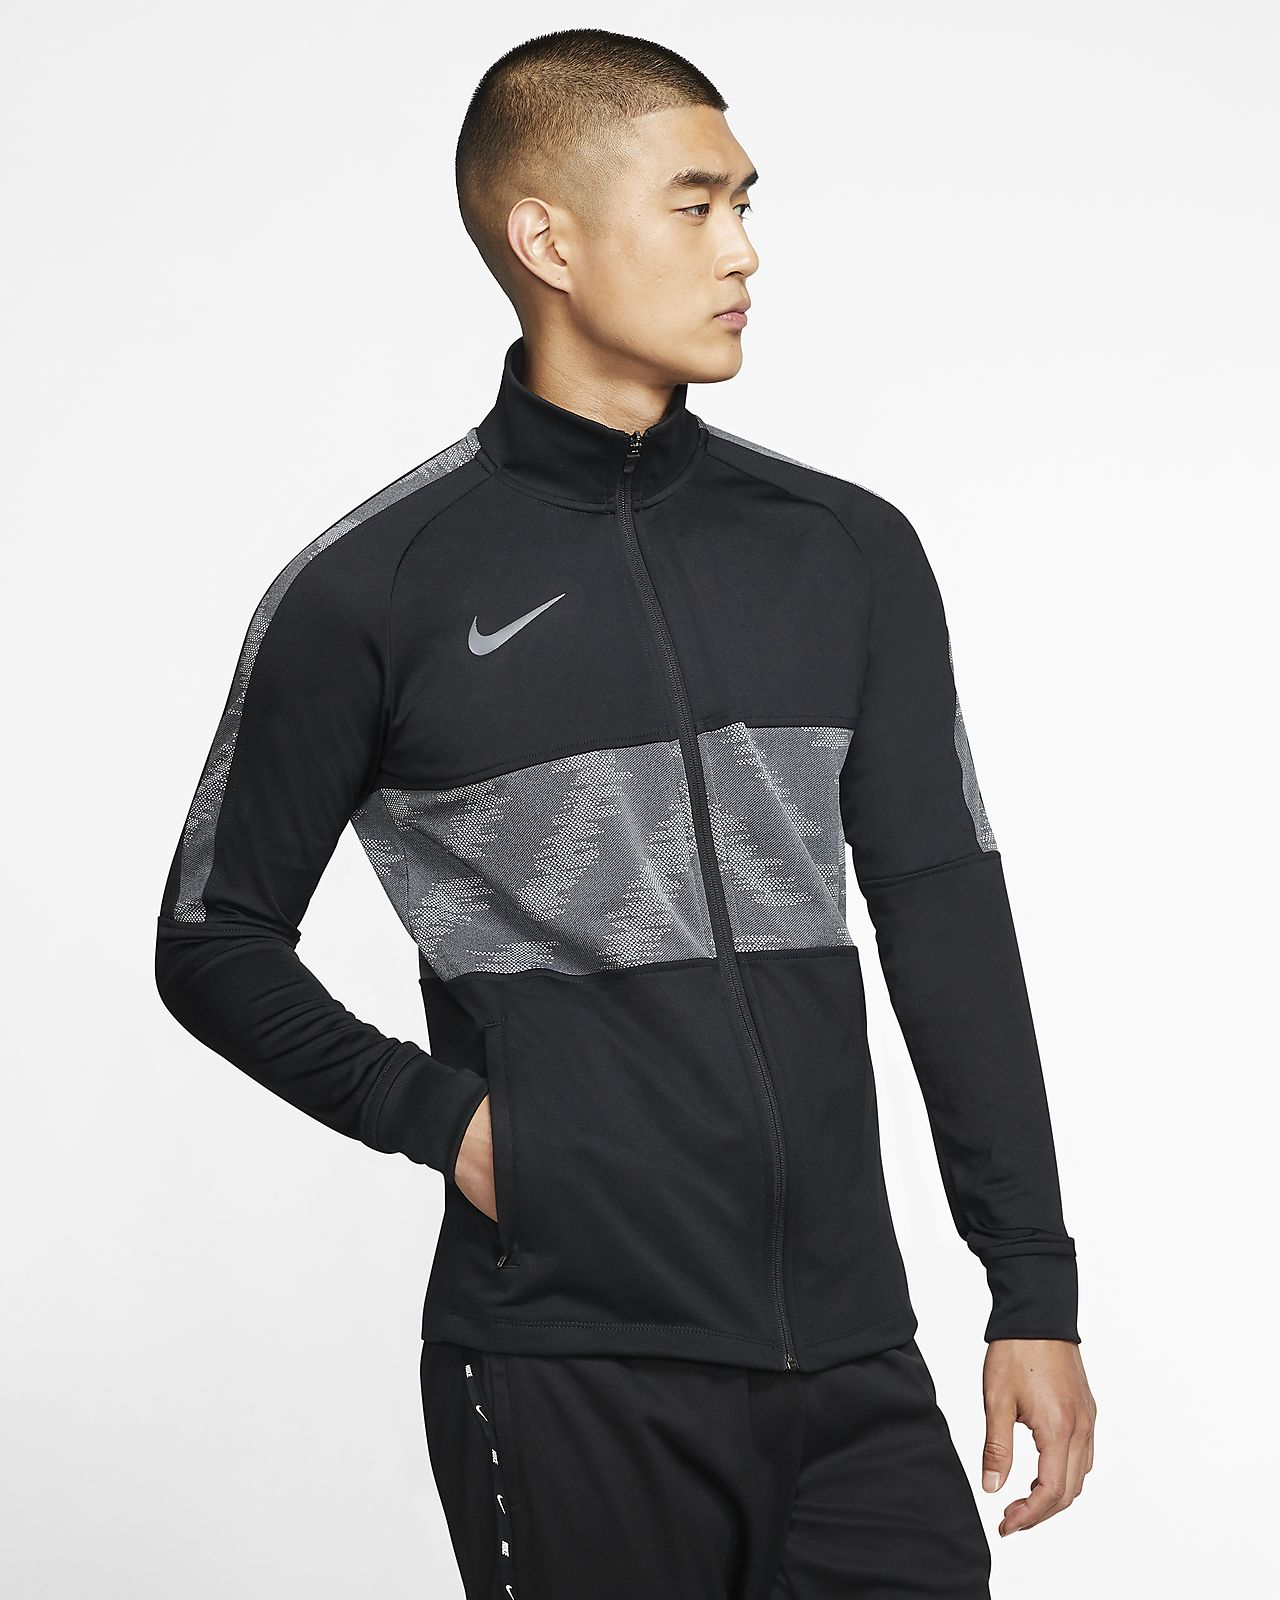 Nike Dri-FIT Strike Men's Football Jacket